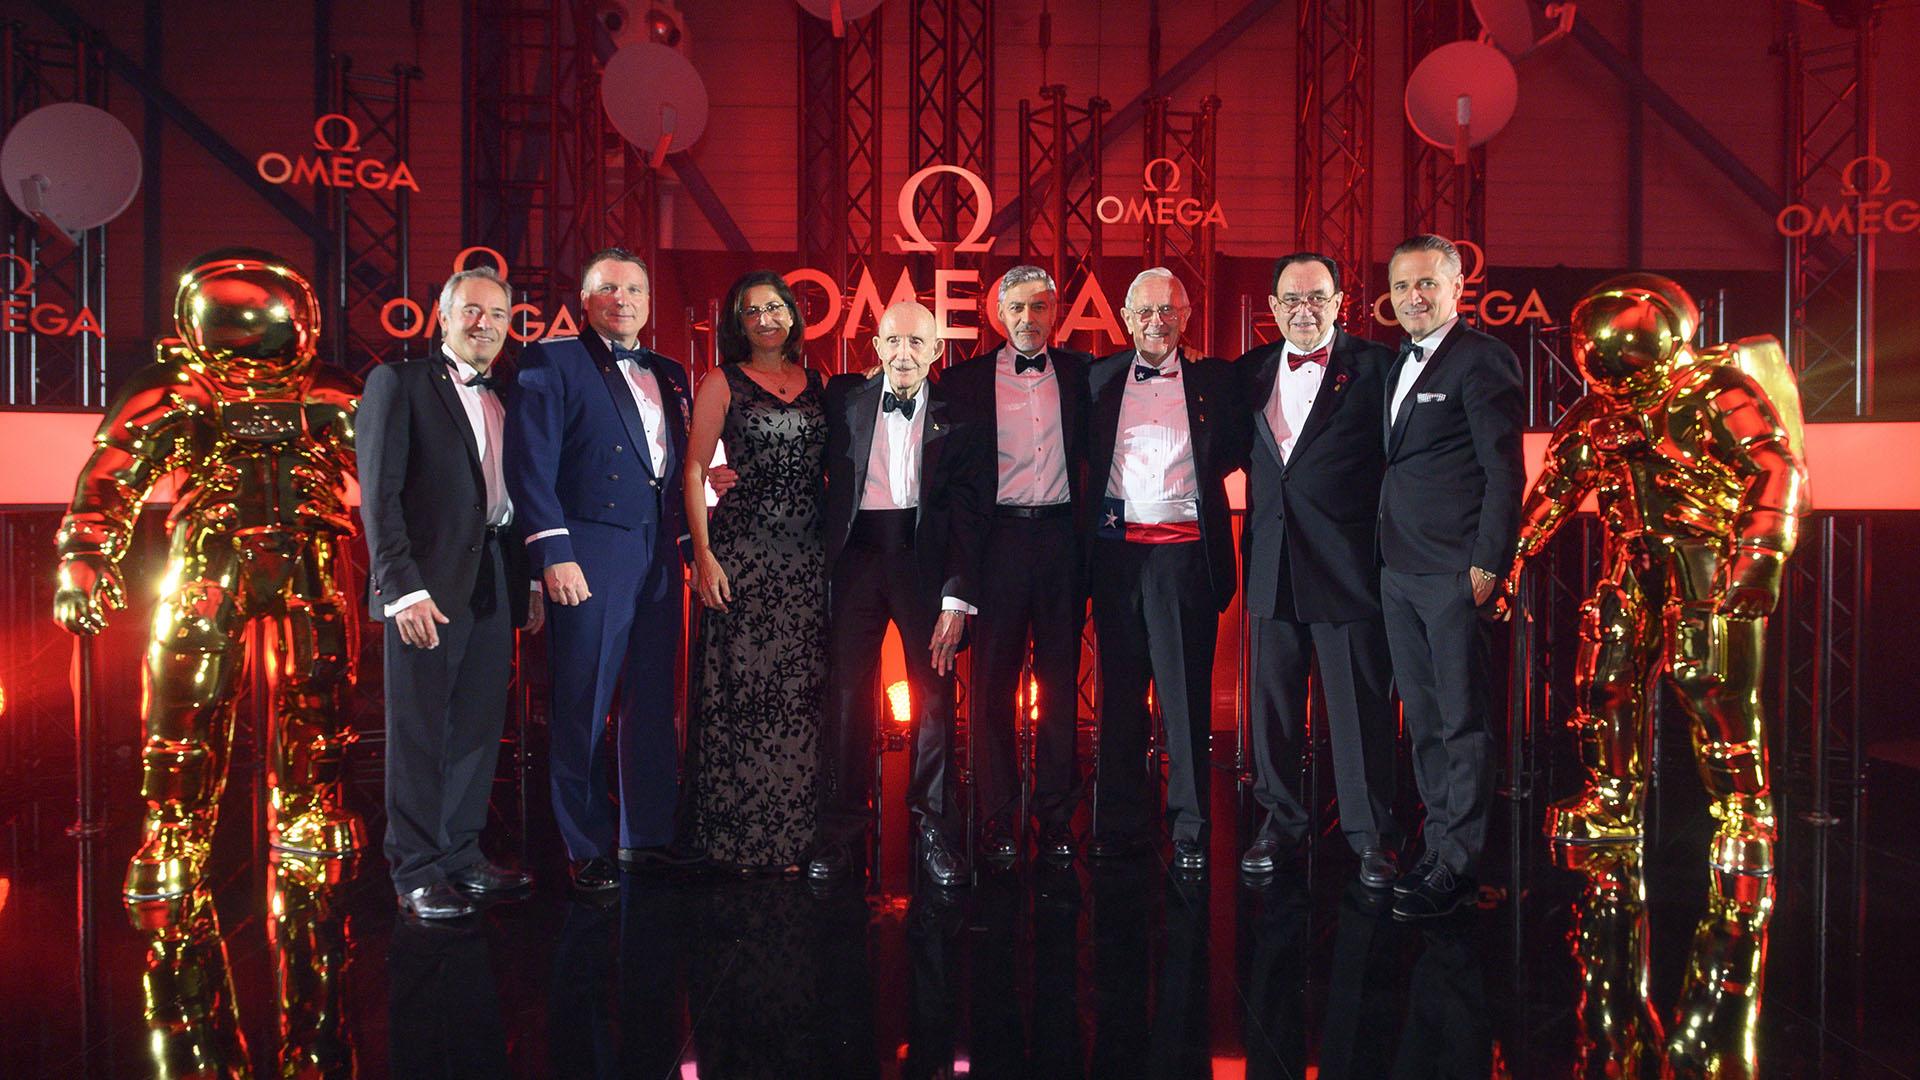 Jean-François Clervoy, Terry Virts, Nicole Stott, Thomas Stafford, George Clooney, Charlie Duke, James Ragan y Raynald Aeschlimann